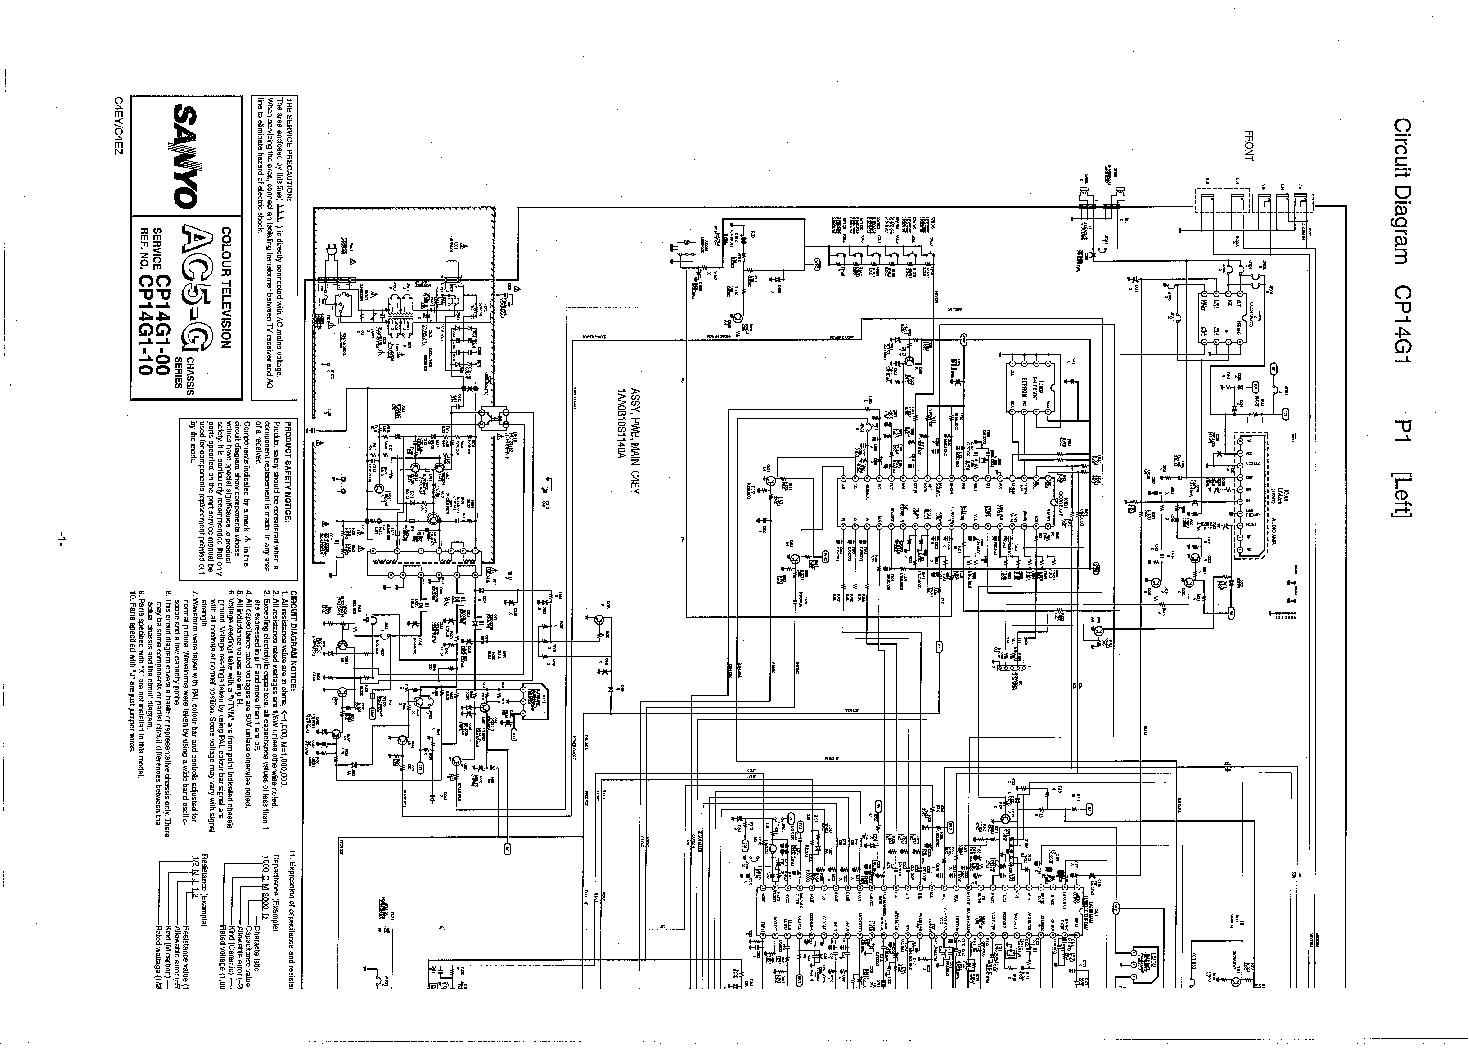 AK_4942] Wiring Diagram Ac Sanyo Free Diagram | Sanyo Tv Wiring Diagram |  | Over Atolo Rosz Epsy Pap Mohammedshrine Librar Wiring 101